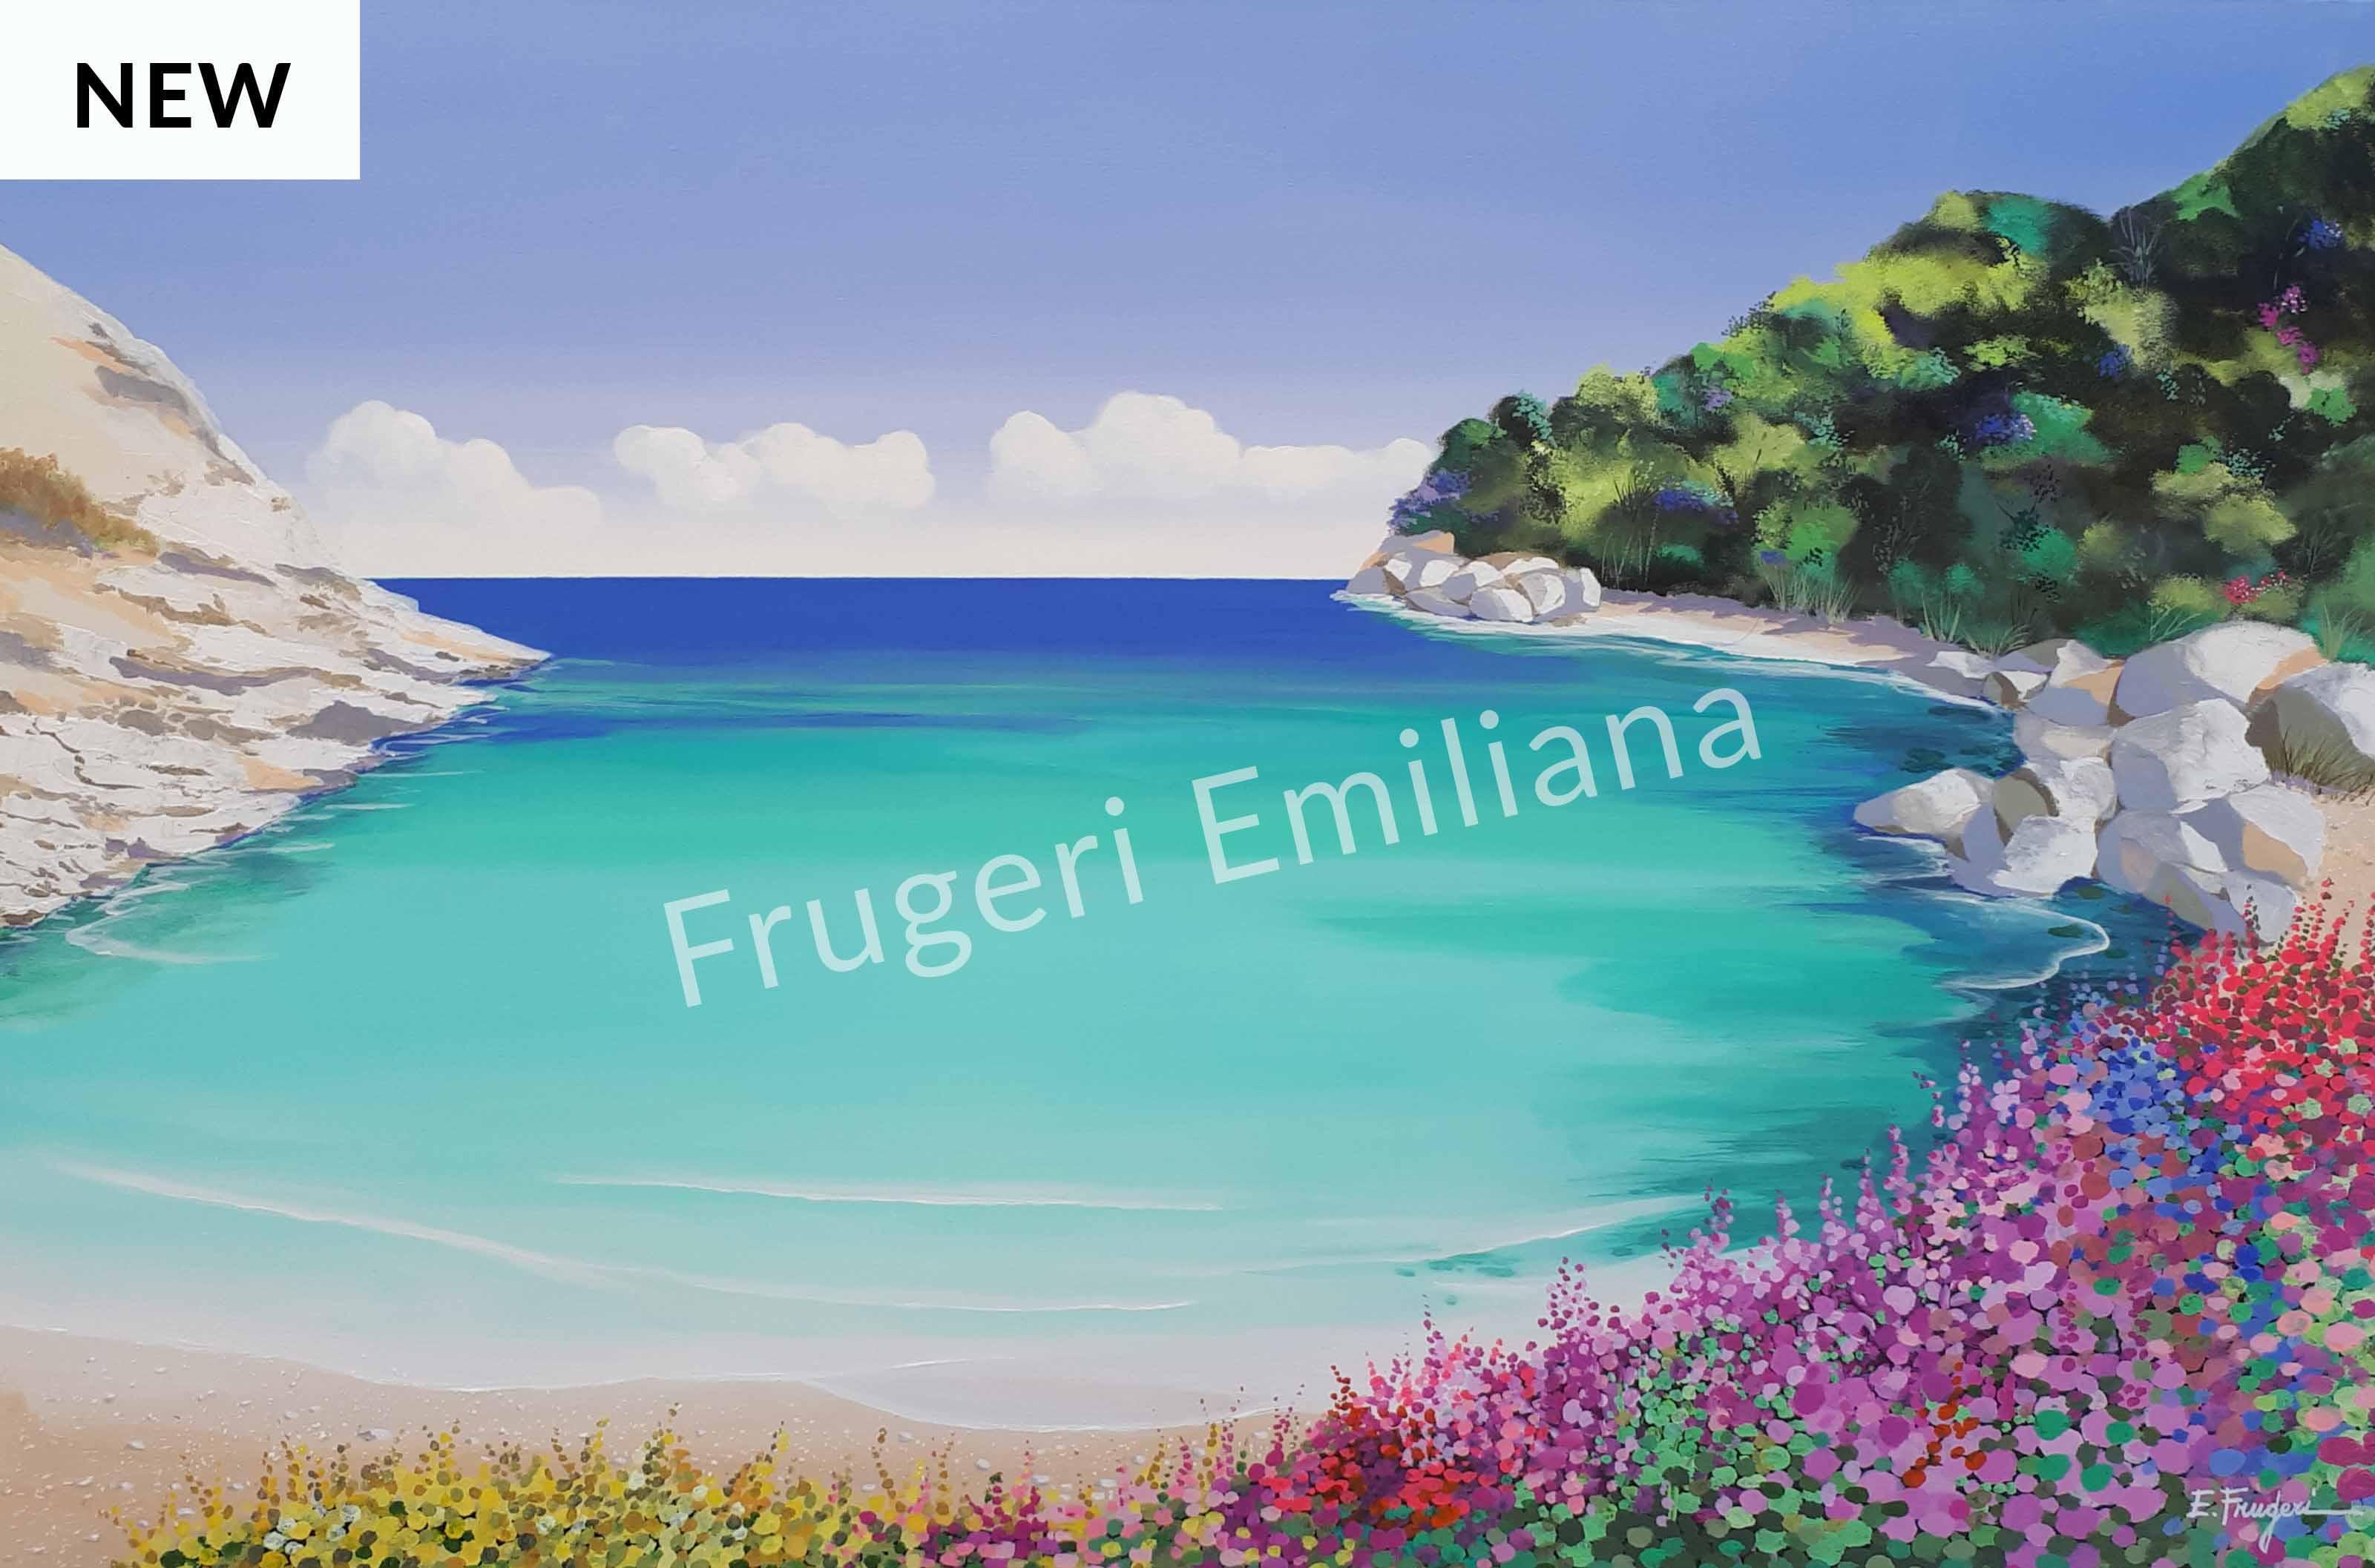 Paesaggi marini frugeri emiliana for Immagini fondali marini da colorare